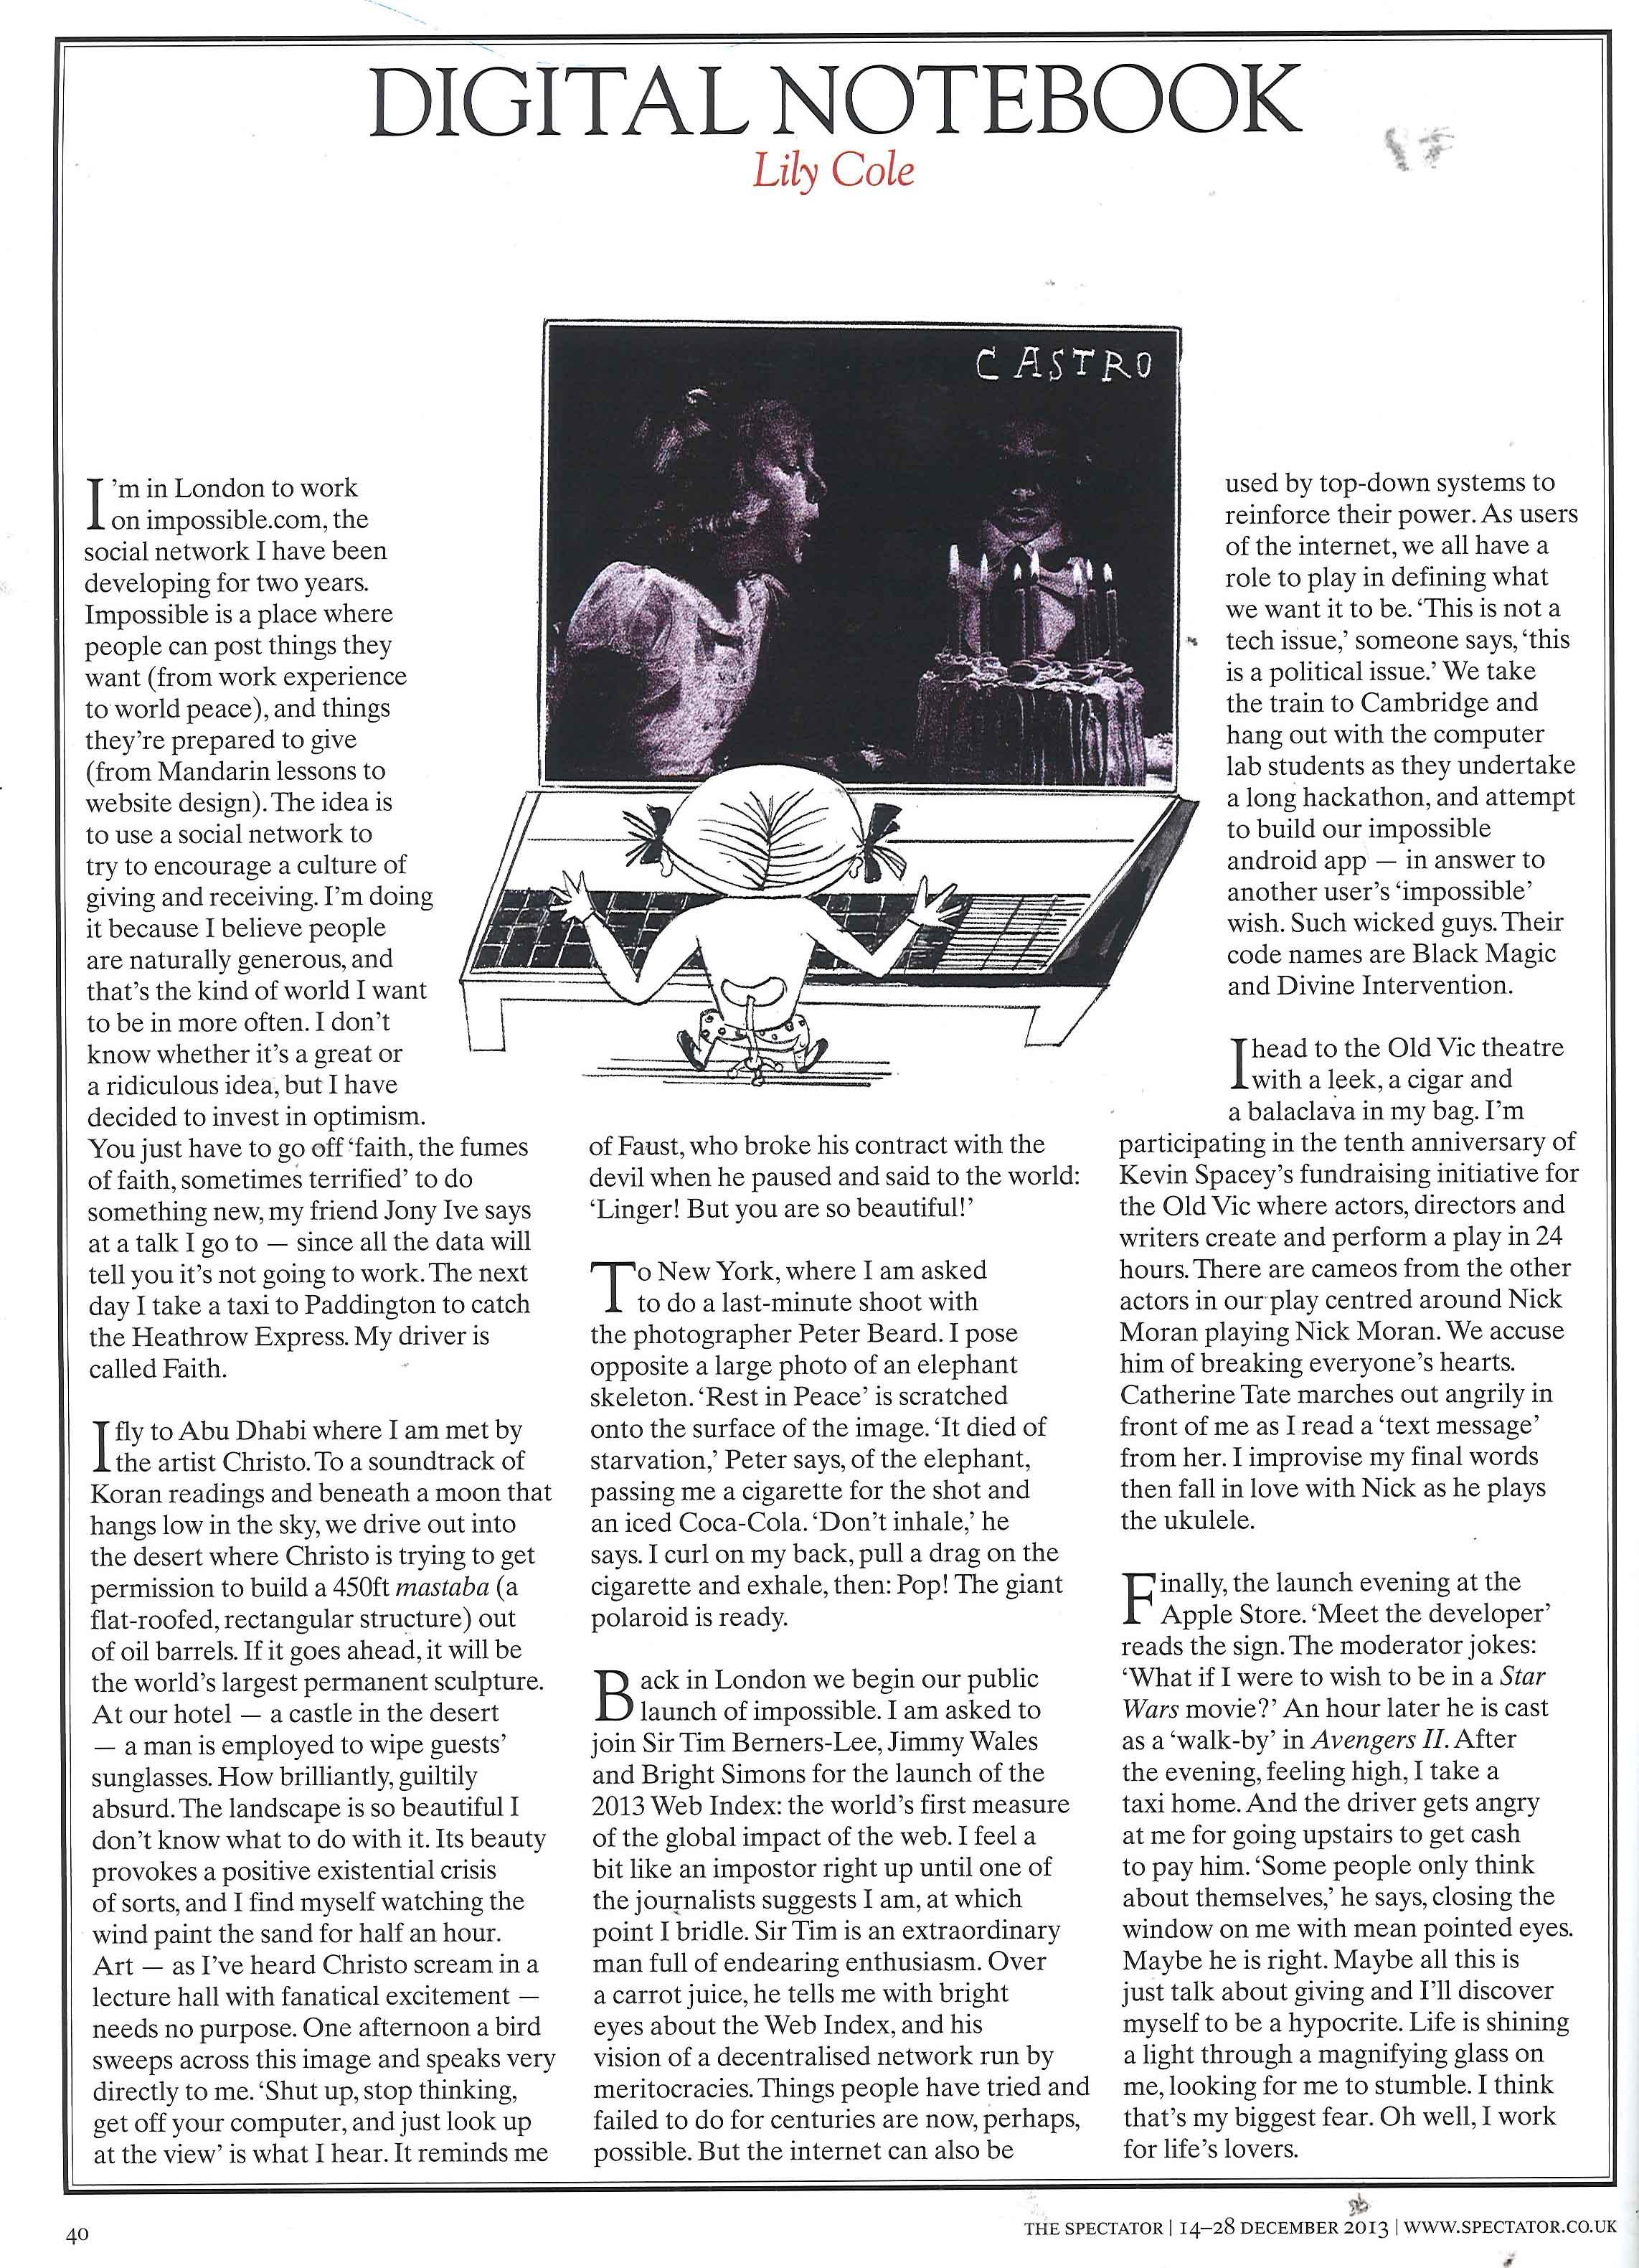 The Spectator, 12th December 2013, p. 40